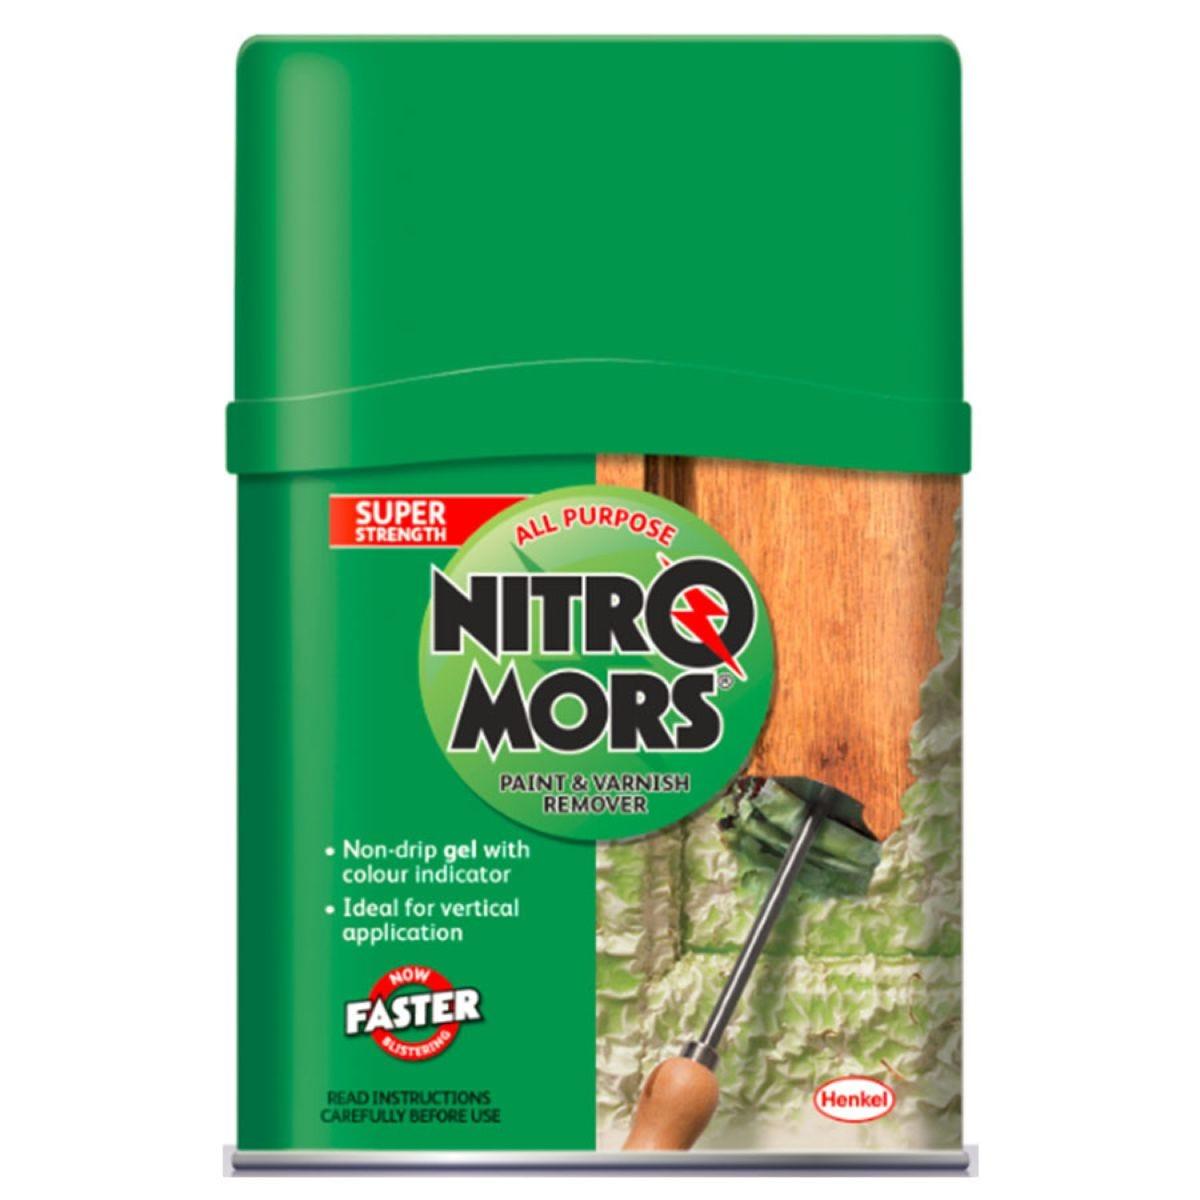 Nitromors Paint & Varnish Remover - 375ml